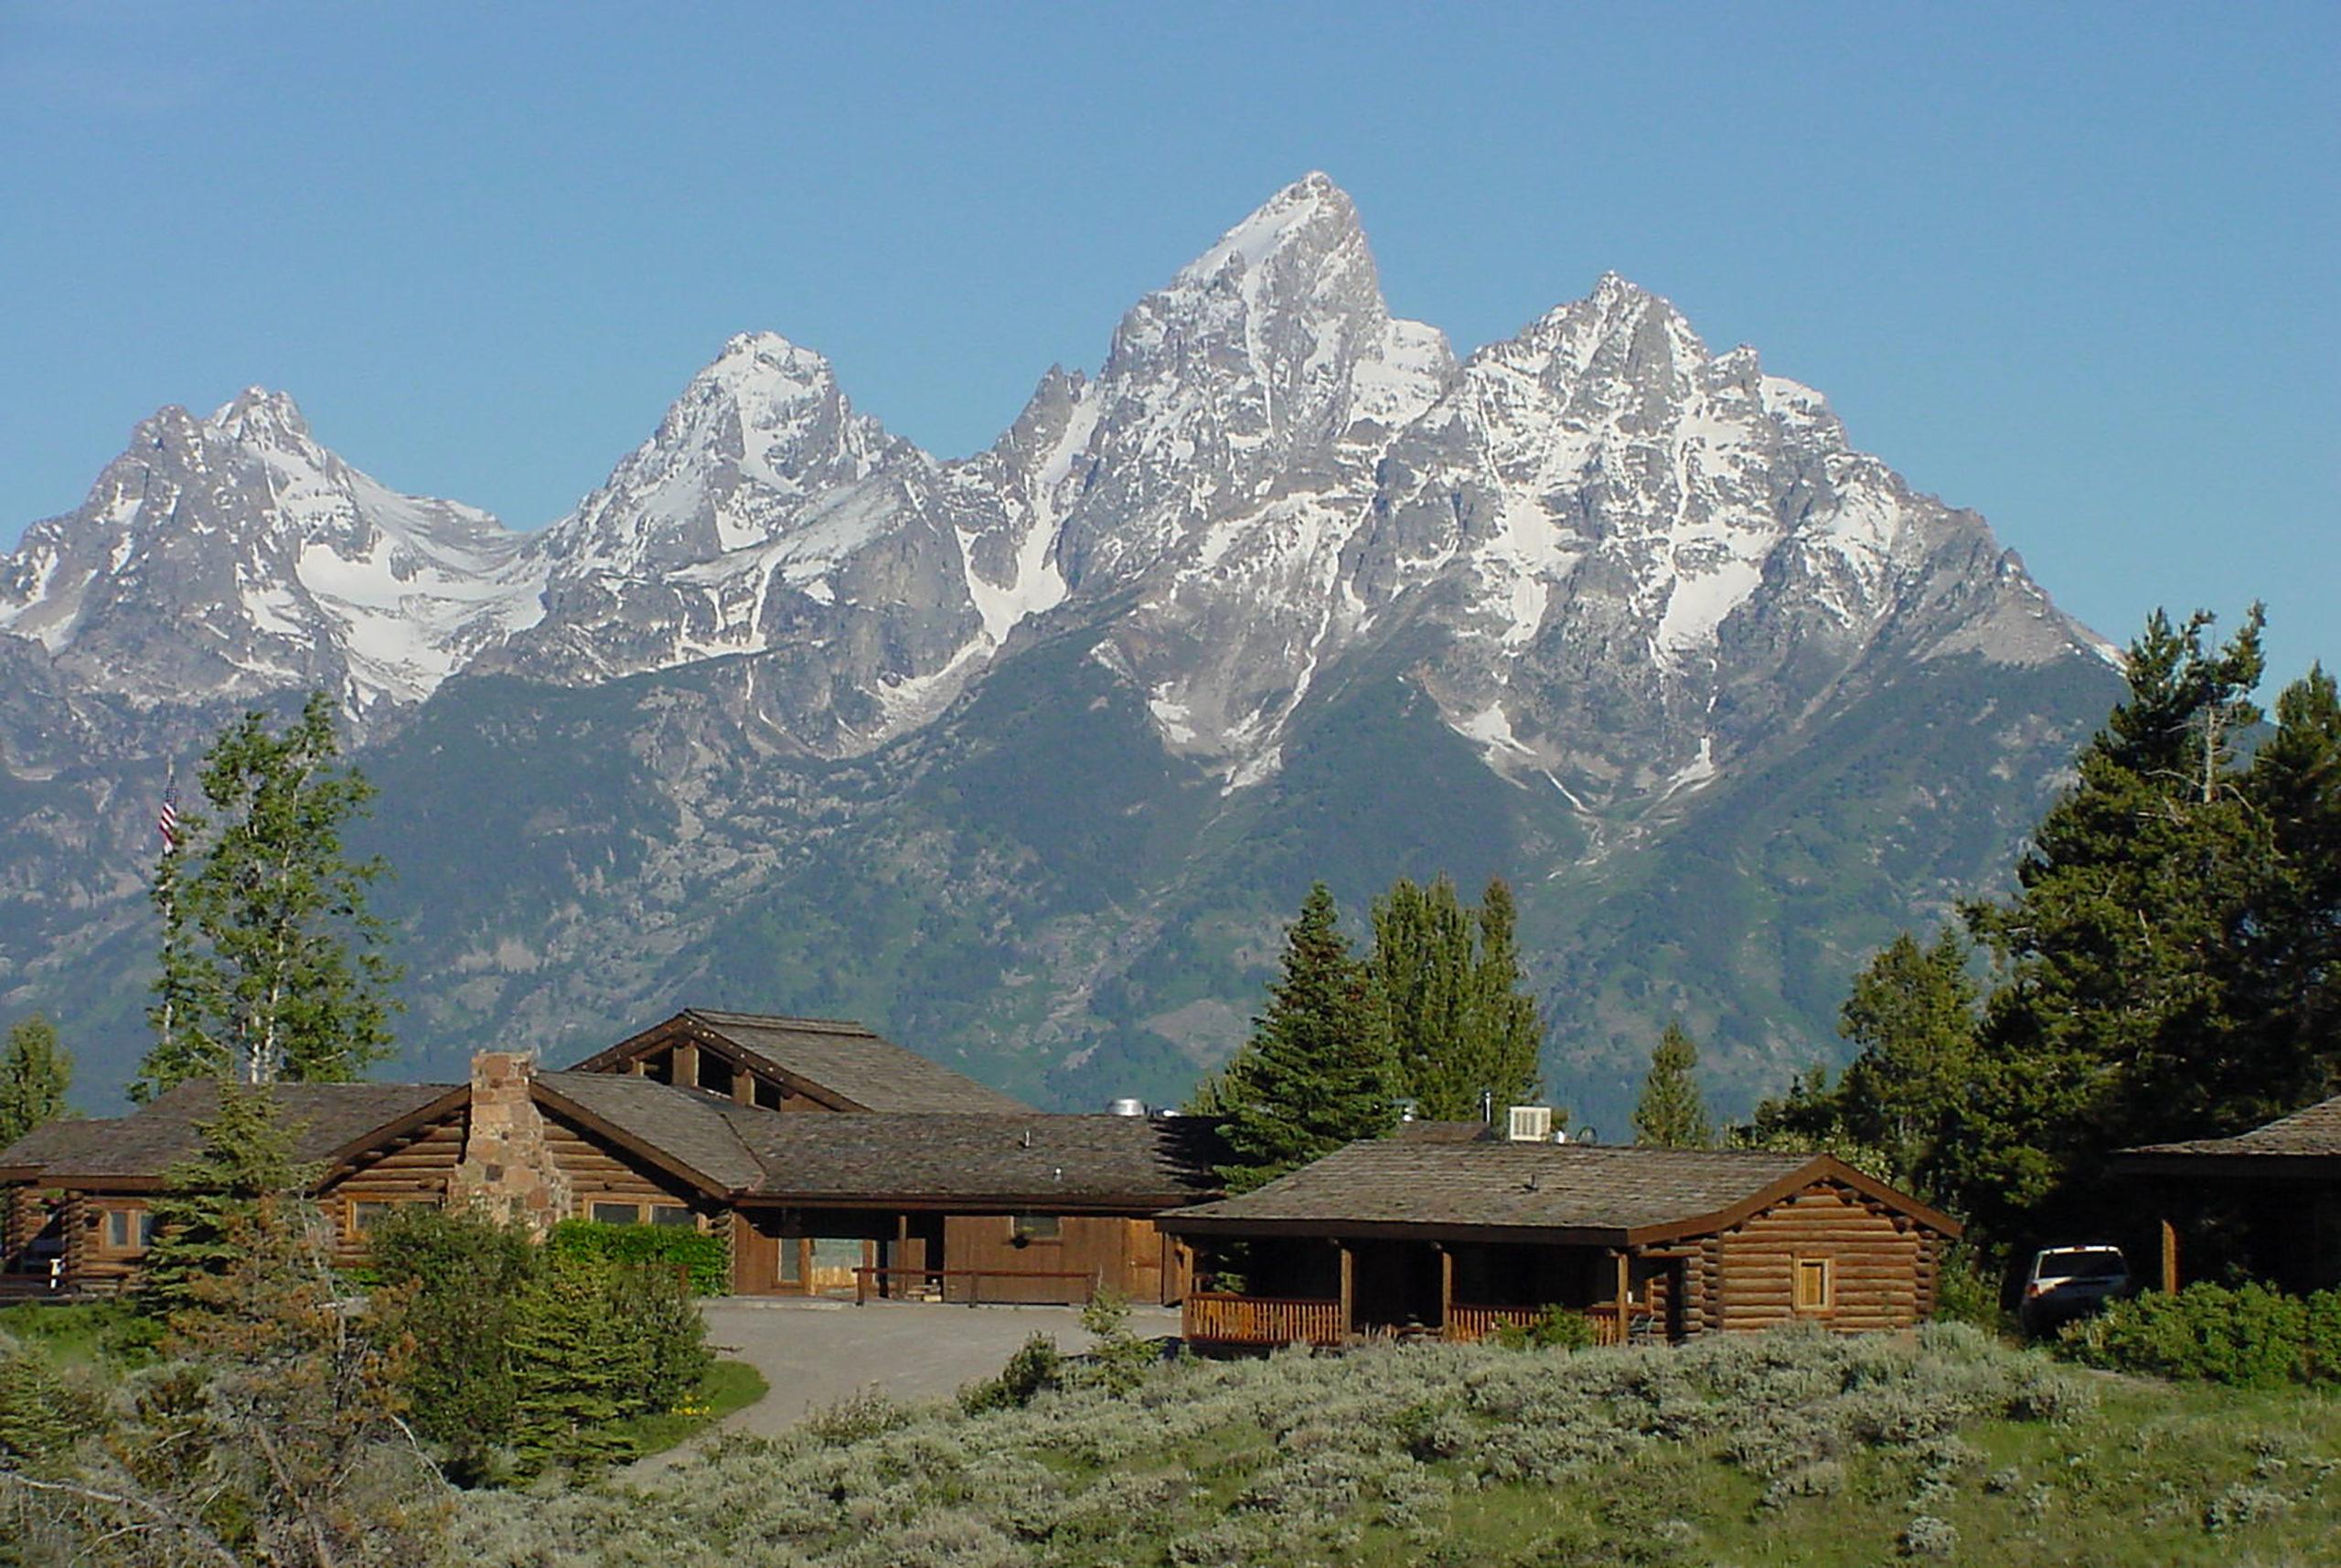 Lost Creek Ranch offers shoulder season discounts